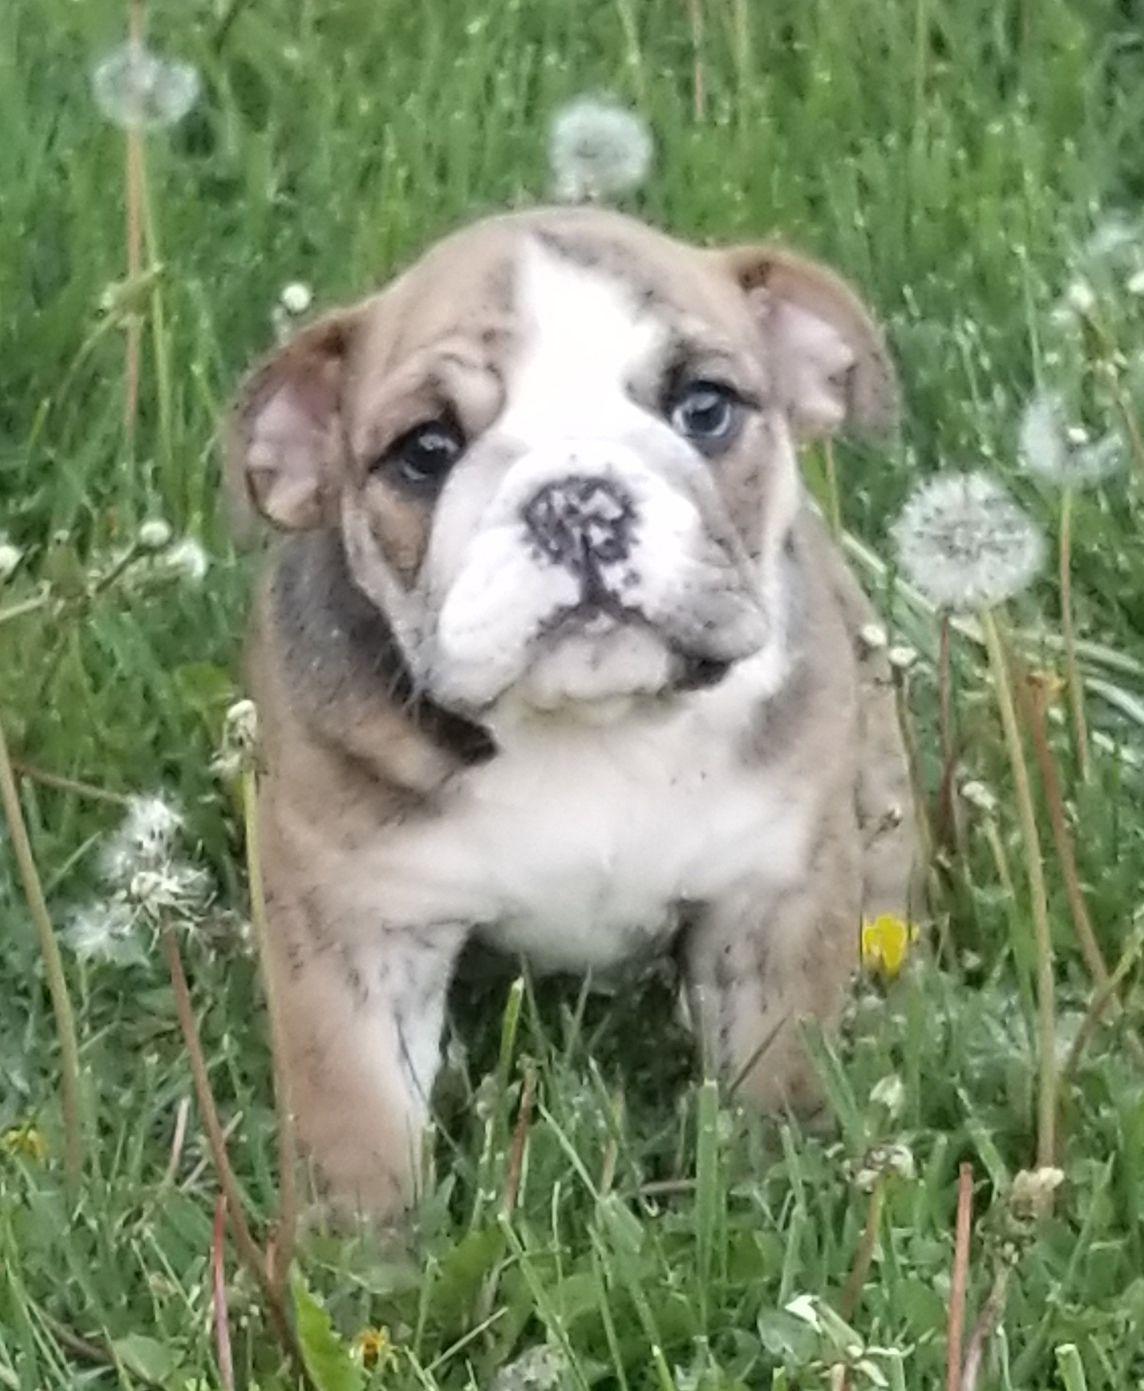 Lexie Is A Brindle Female English Bulldog Puppy American Born And